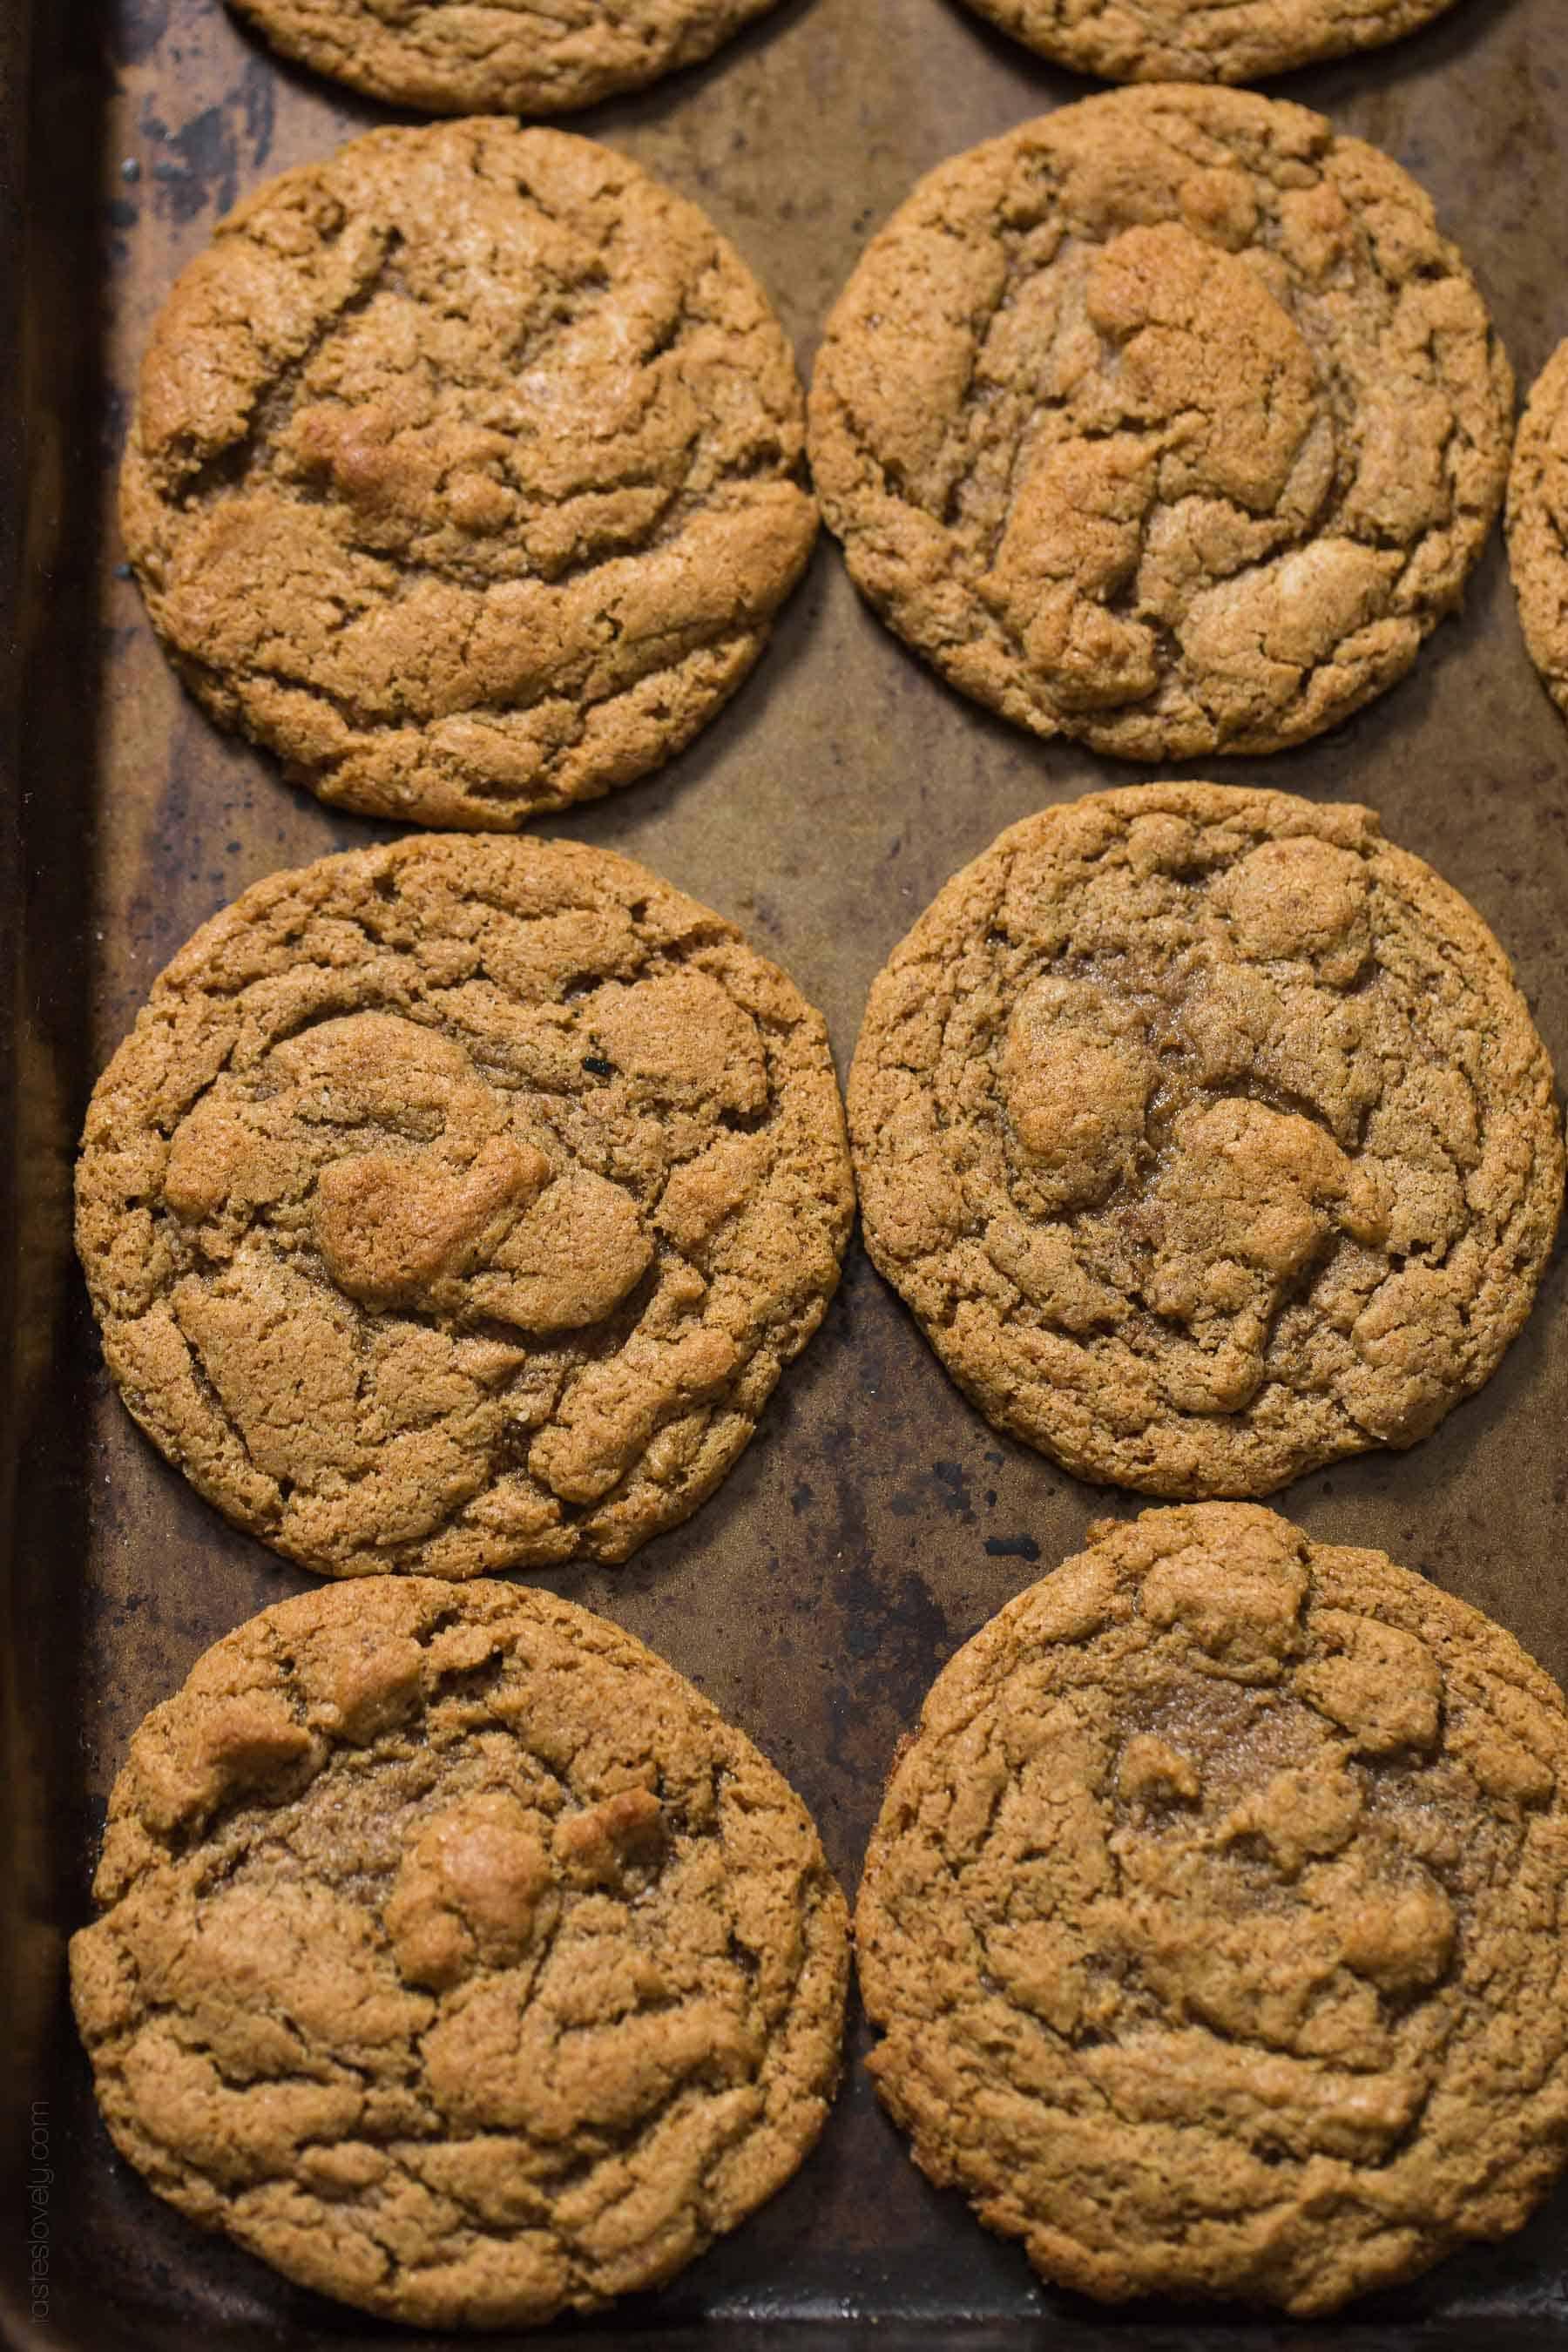 Paleo Almond Butter Cookies Recipe - just 5 ingredients! Paleo, dairy free, gluten free, grain free, refined sugar free dessert.